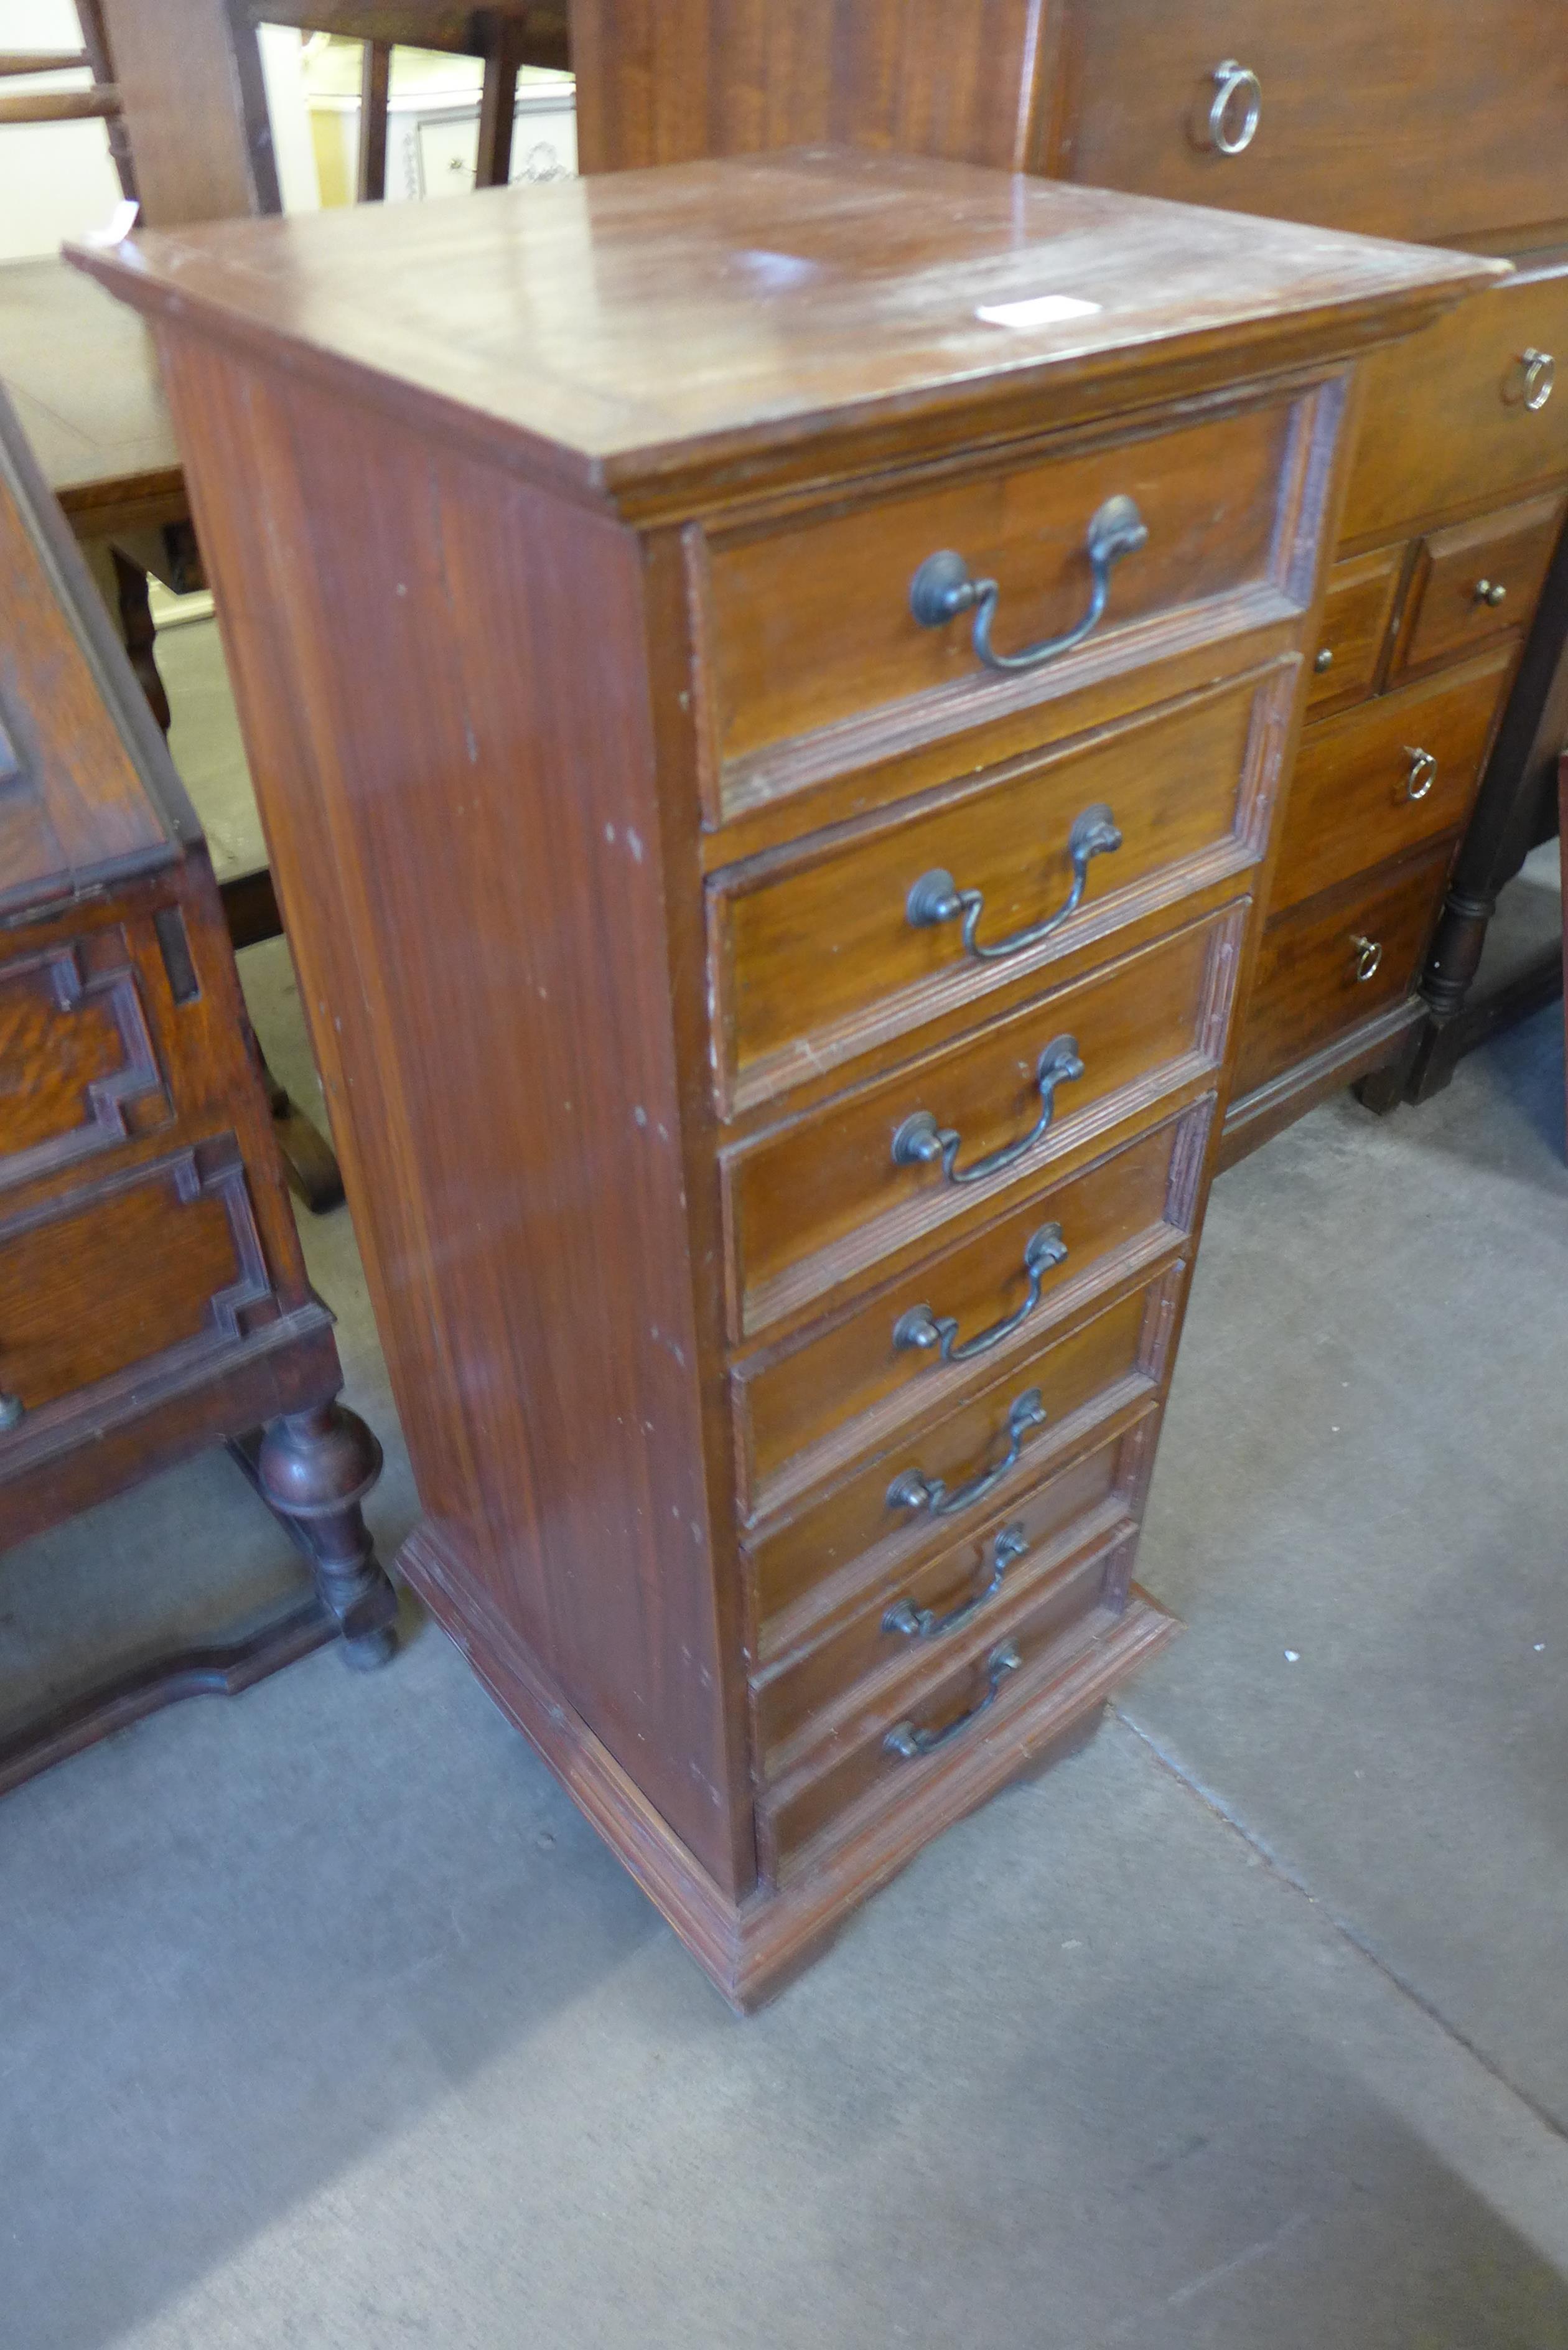 A Semainier mahogany chest of drawers